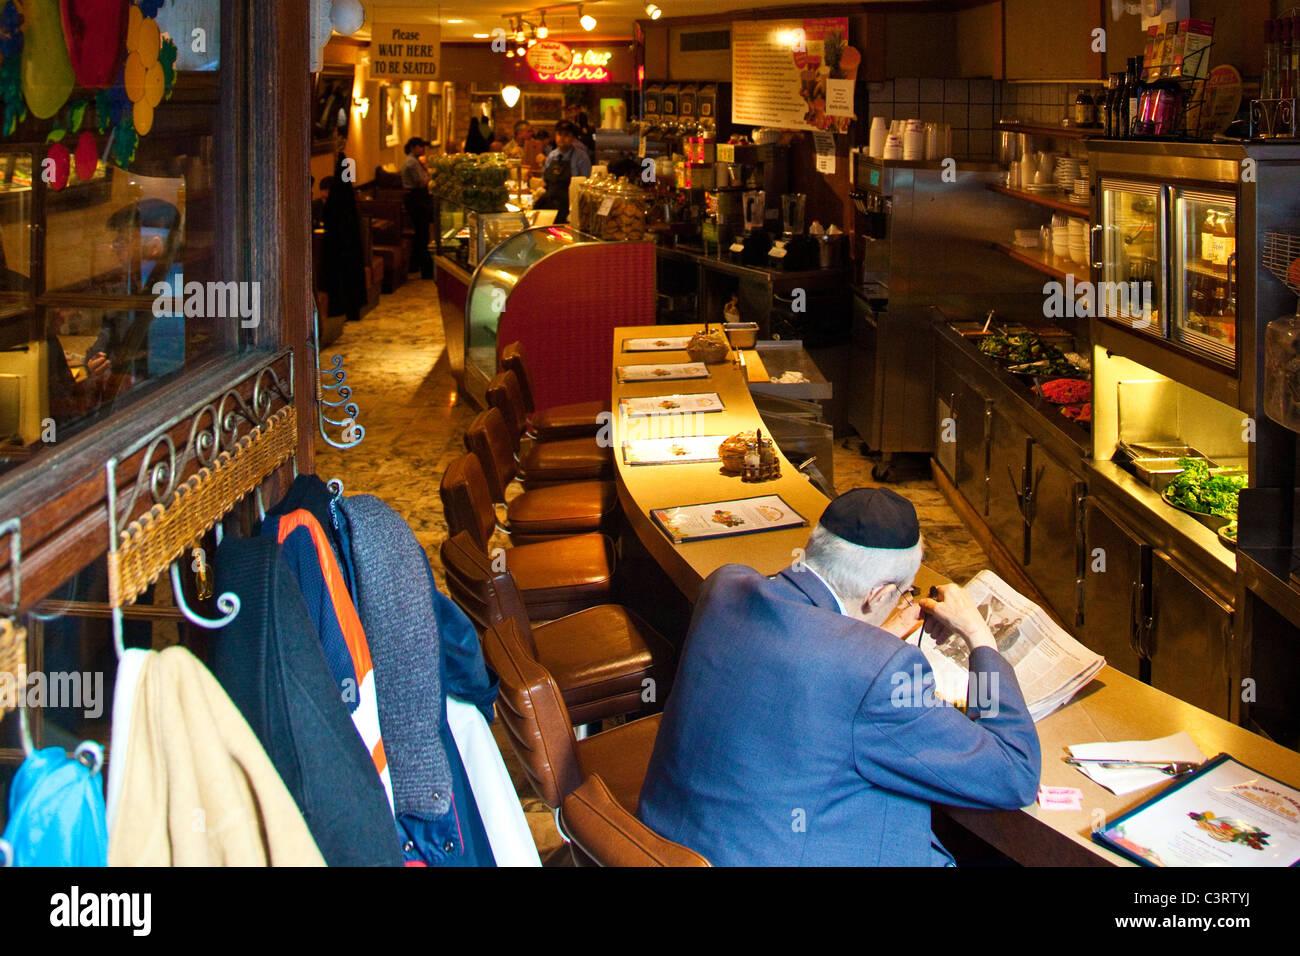 Jewish man in a kosher deli in Manhattan, New York City - Stock Image